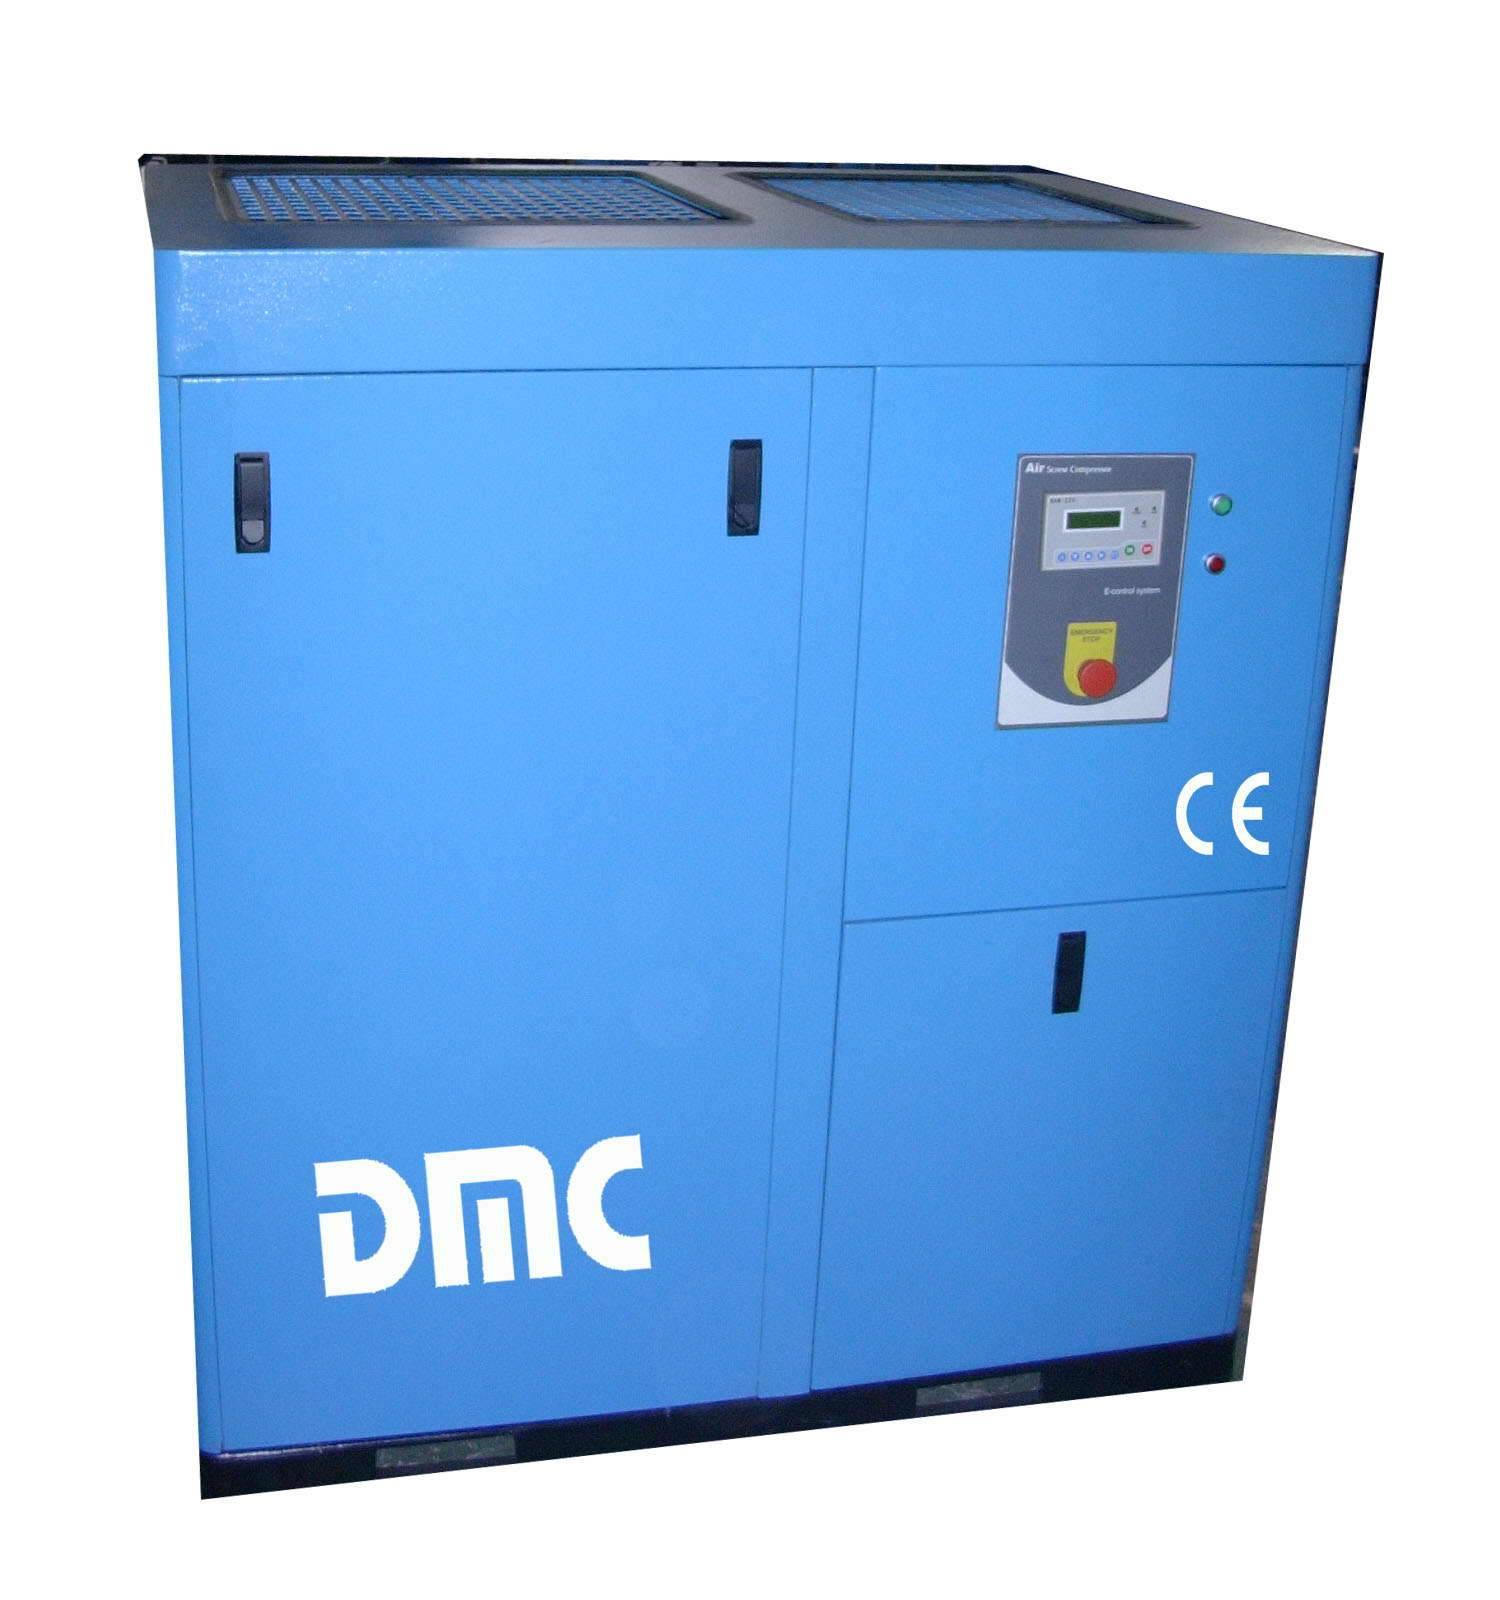 5-10hp screw compressor with build-in dryer